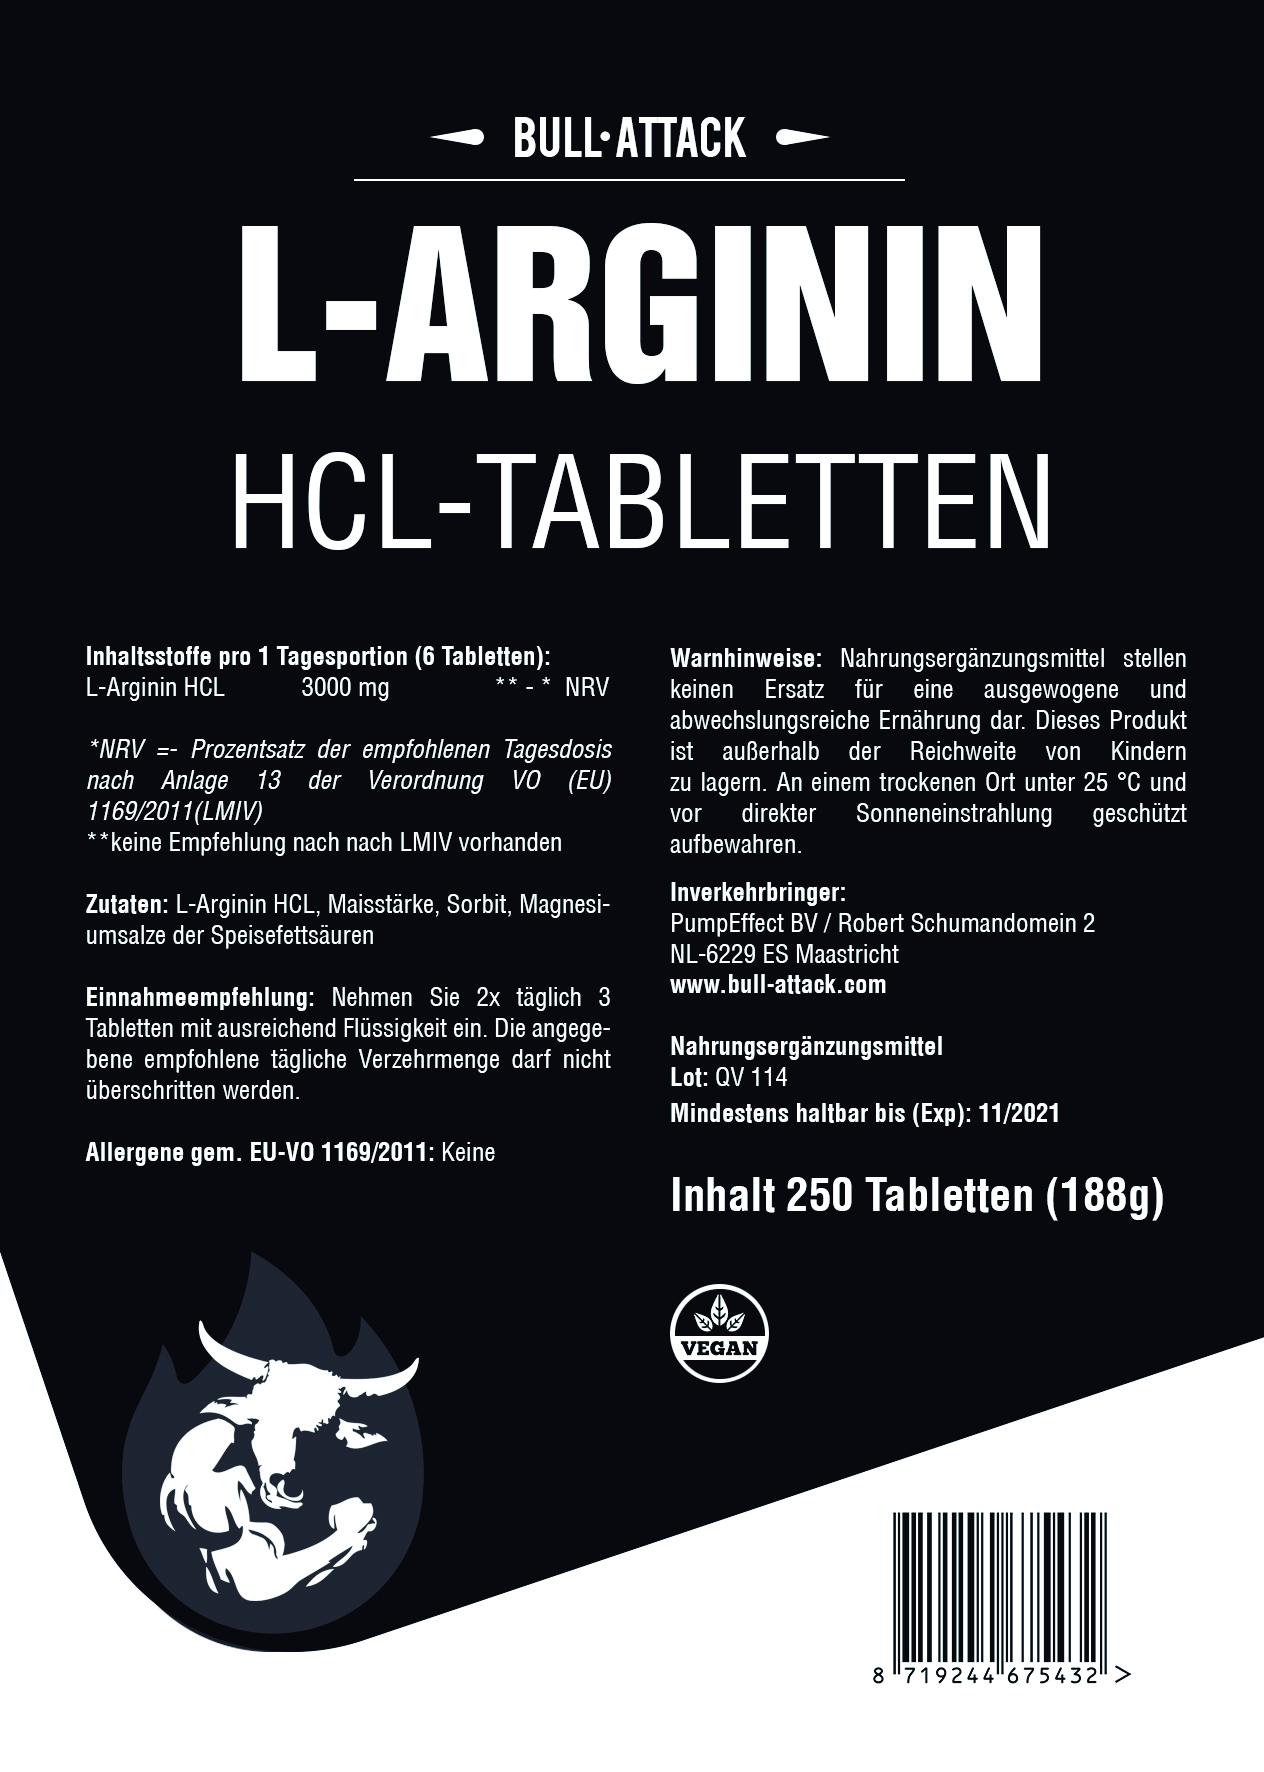 L-Arginin HCL Tabletten | ab 250 hochdosierte Tabletten